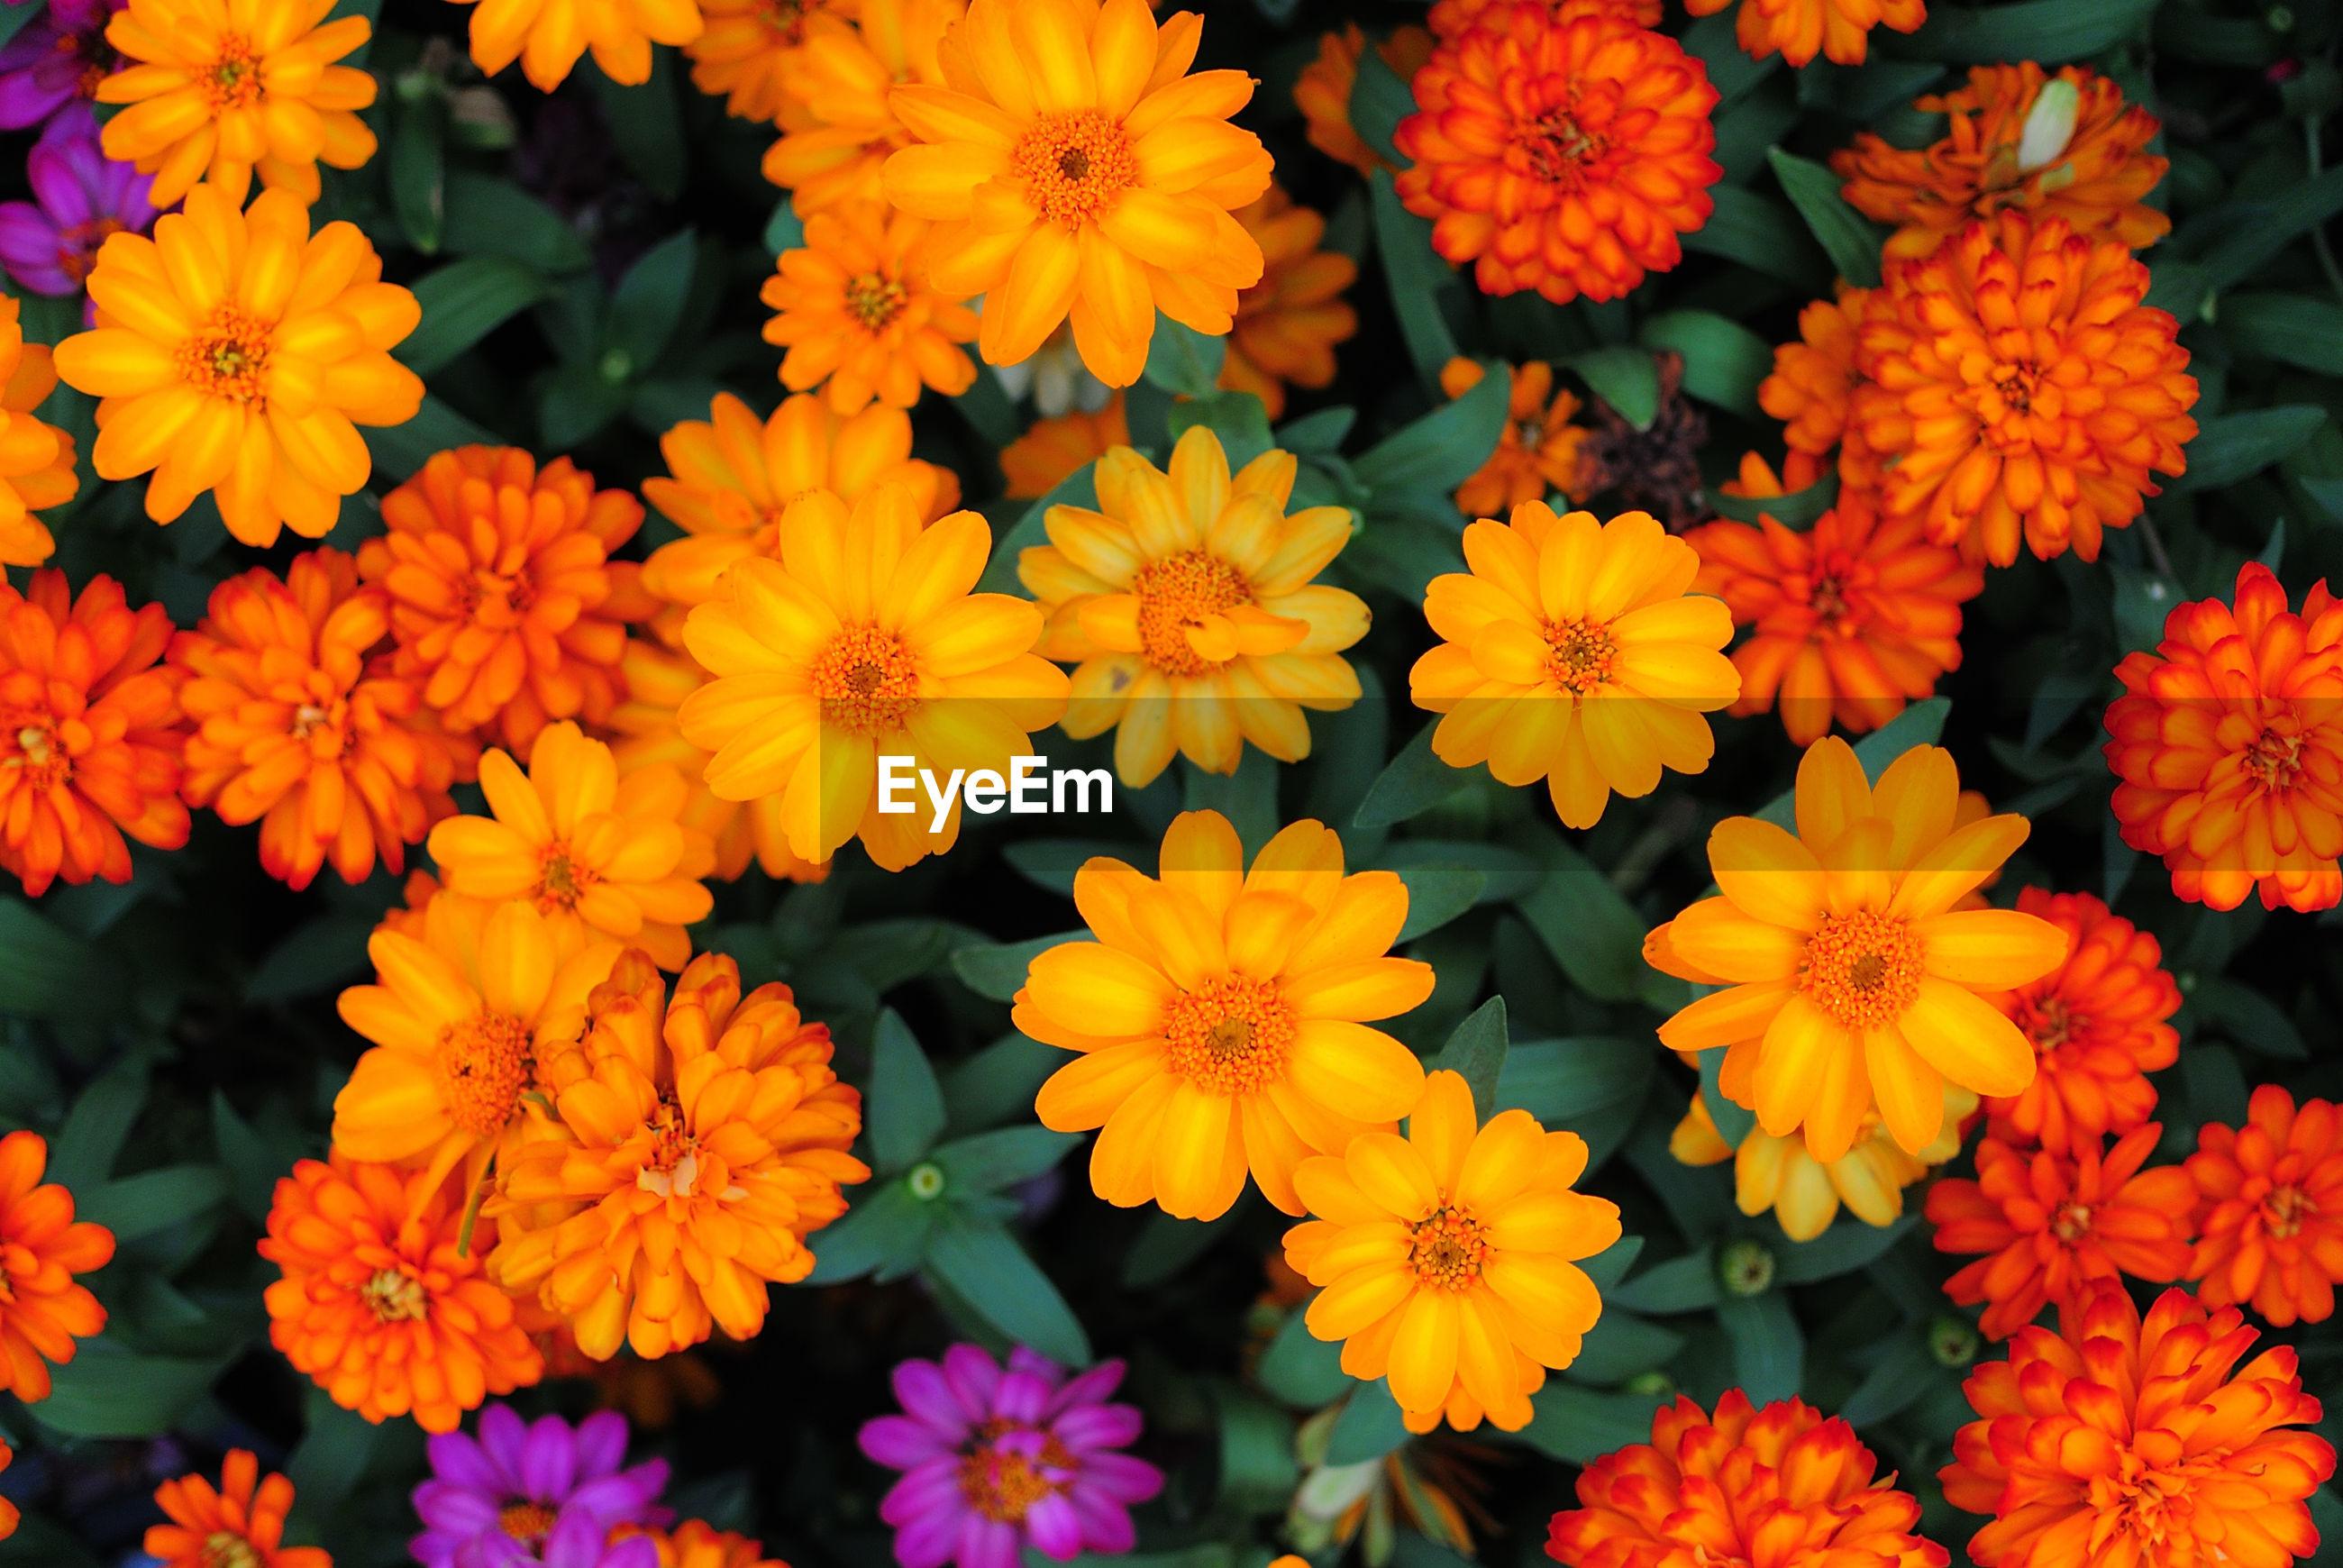 Full frame shot of orange blooming flowers at park